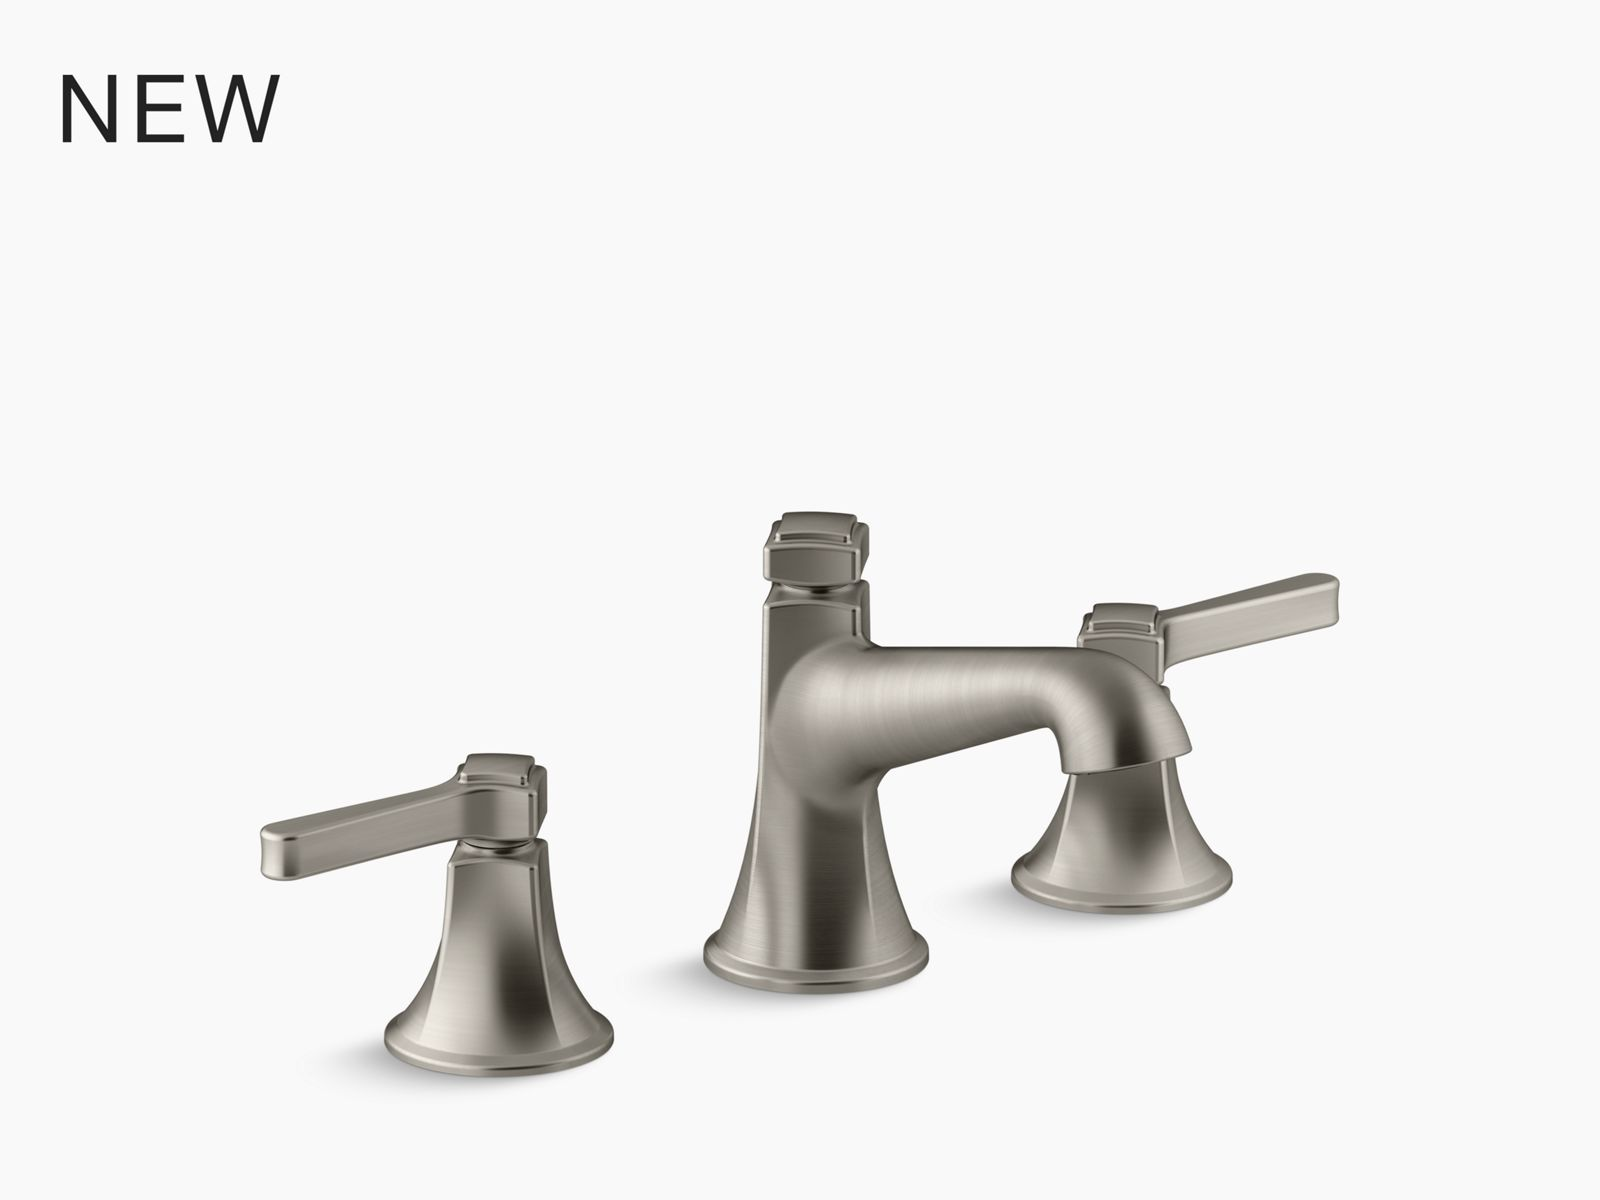 tempered widespread bathroom sink faucet